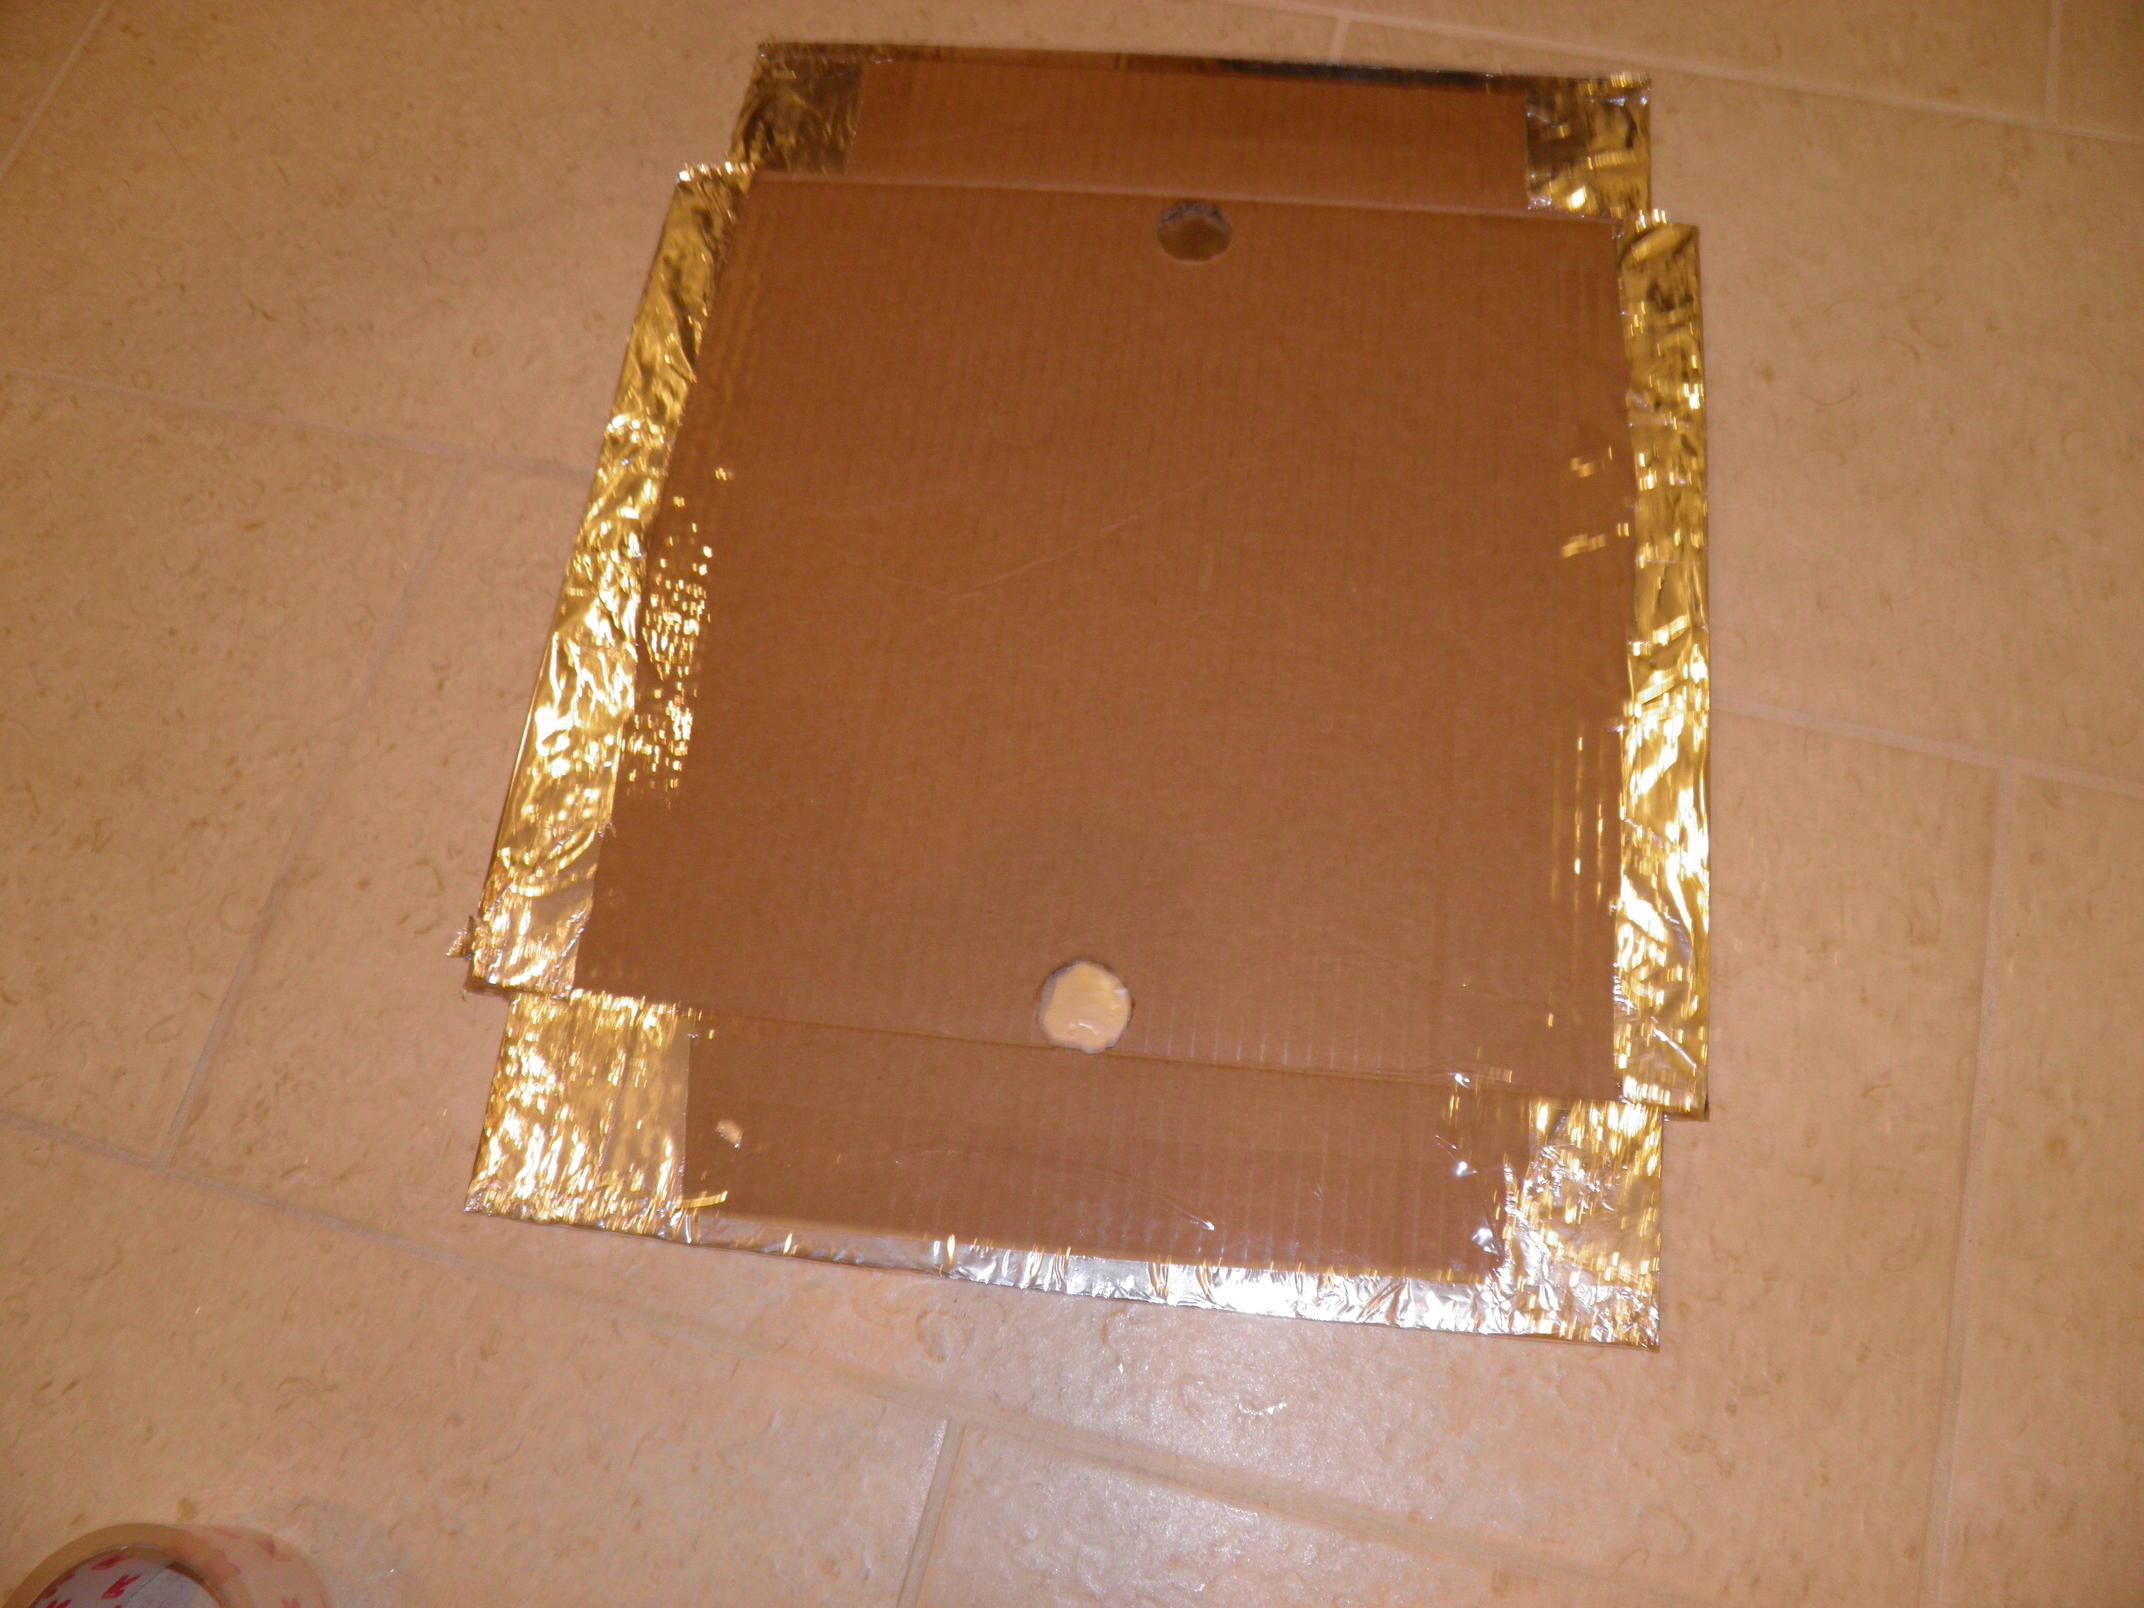 Aluminum Foil Taped to Cardboard